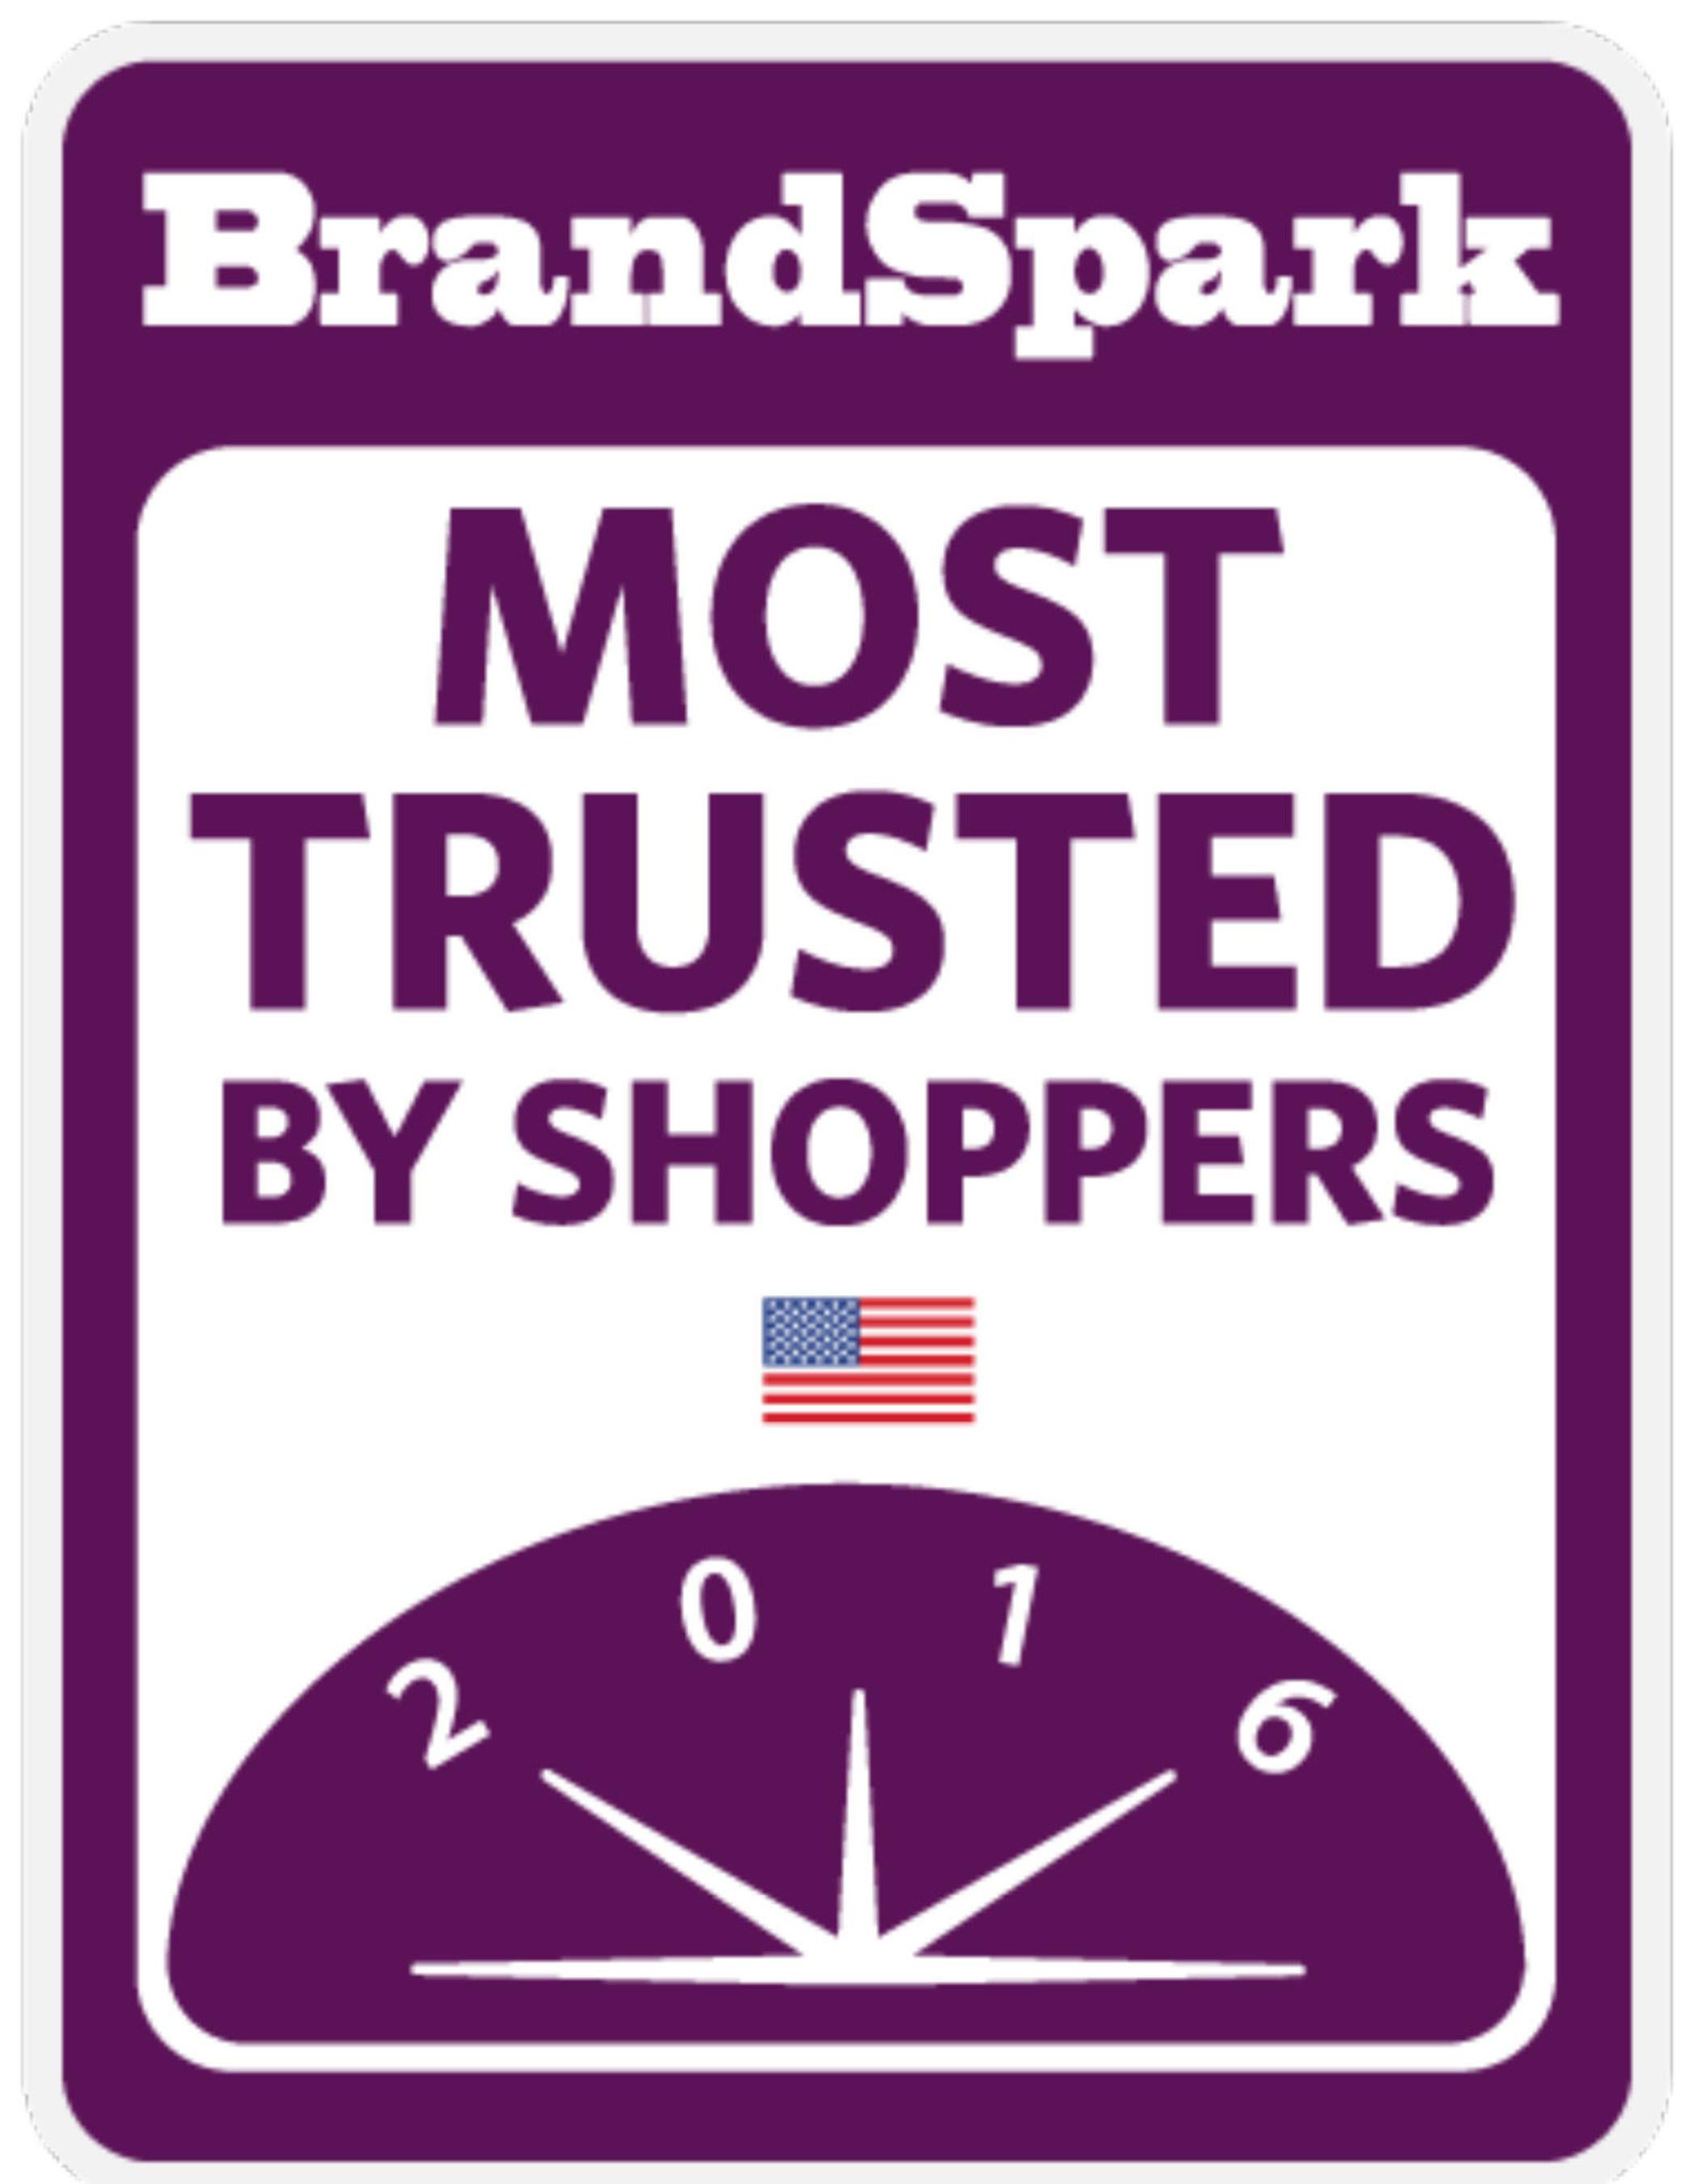 2016 BrandSpark Most Trusted Awards Logo (PRNewsFoto/BrandSpark International)